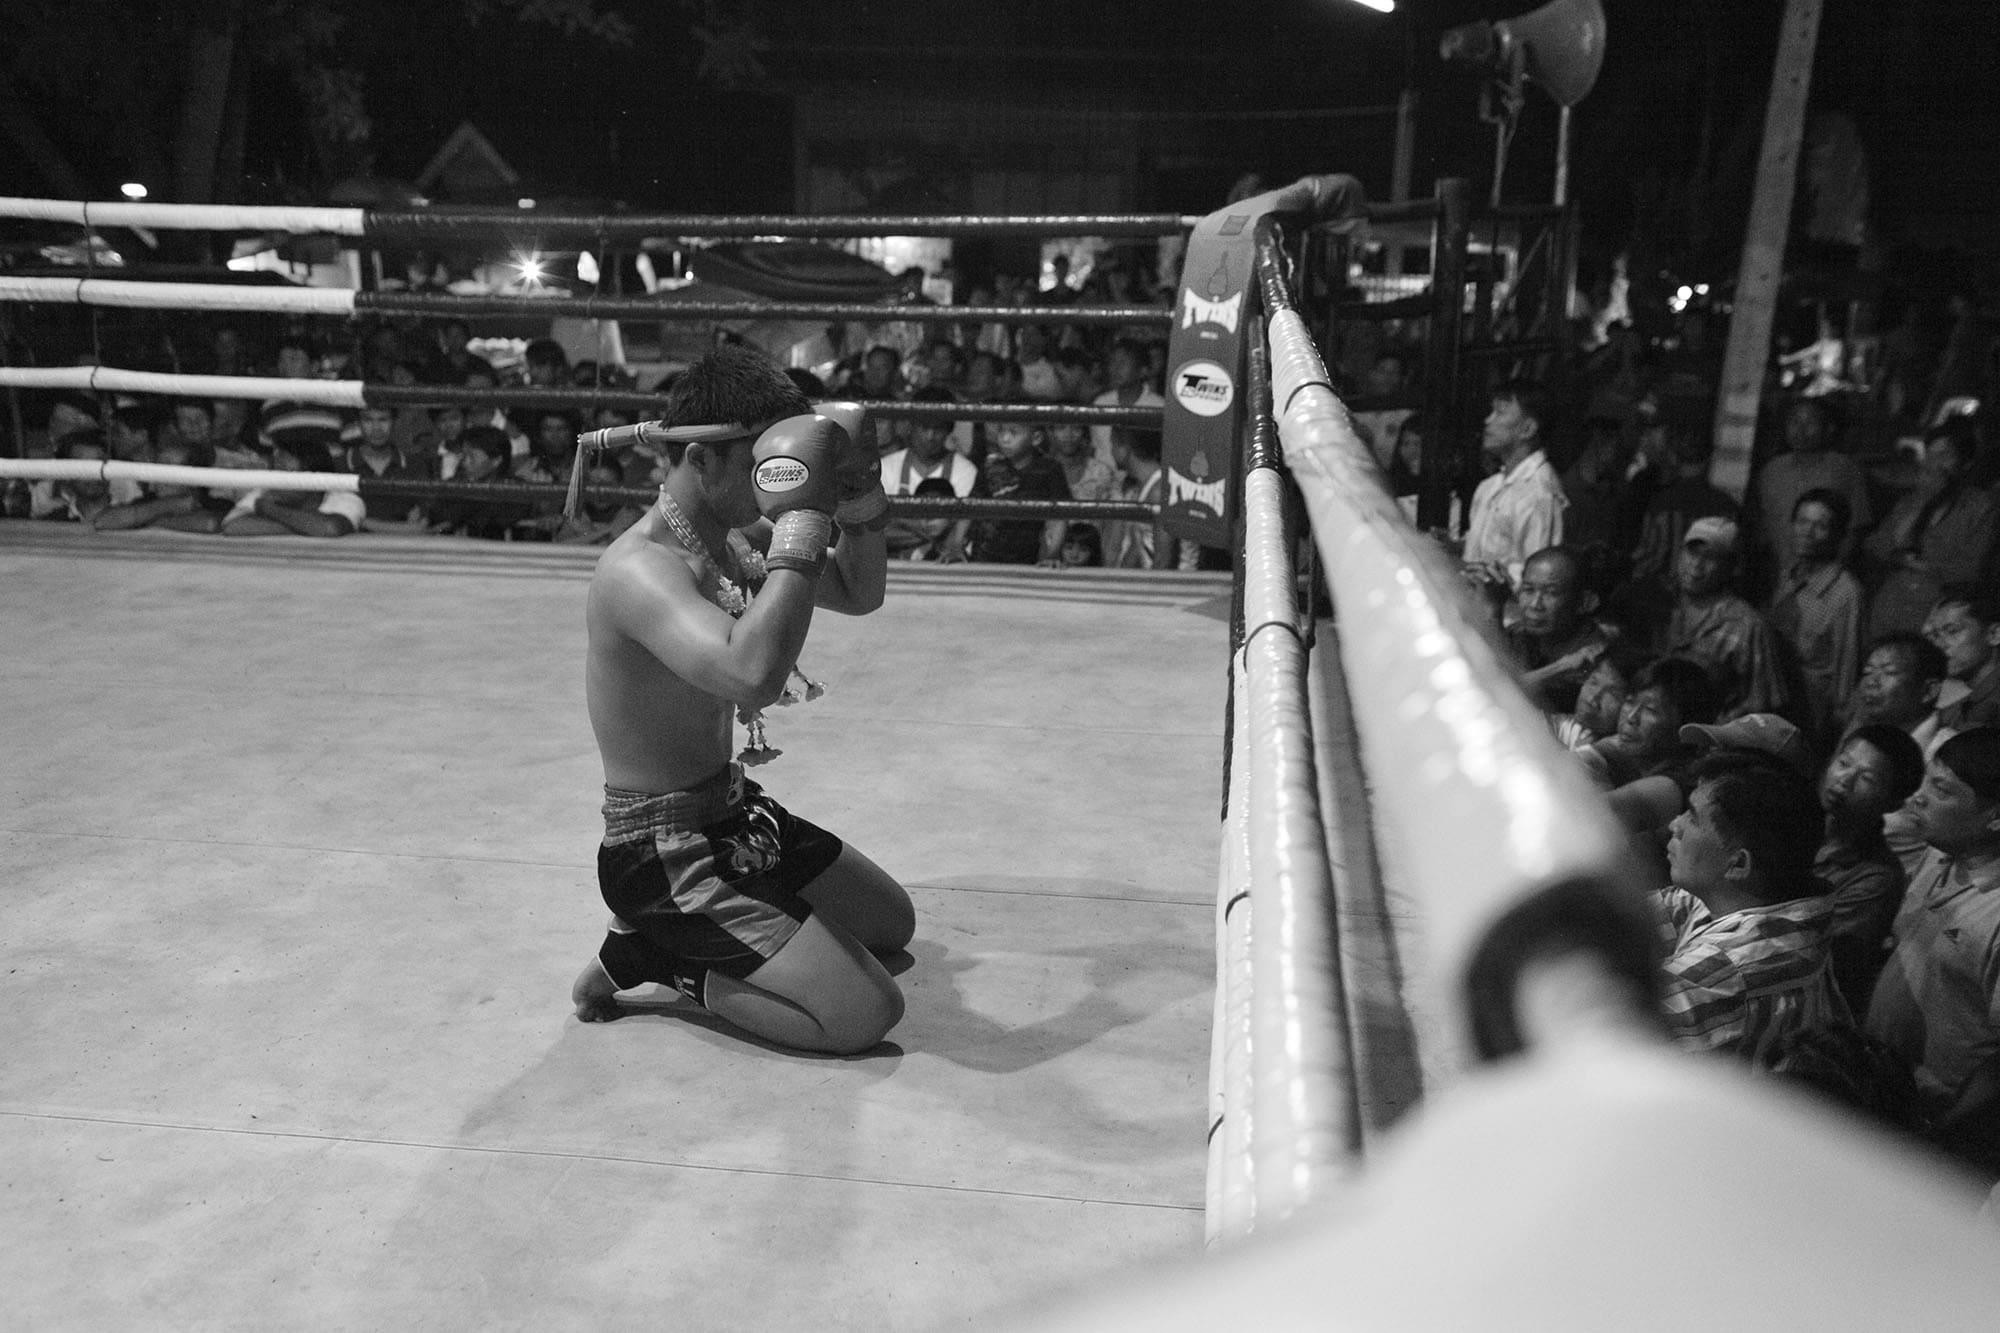 Chiang Mai Muay Thai boxing  fight in Chiang Mai, Thailand.